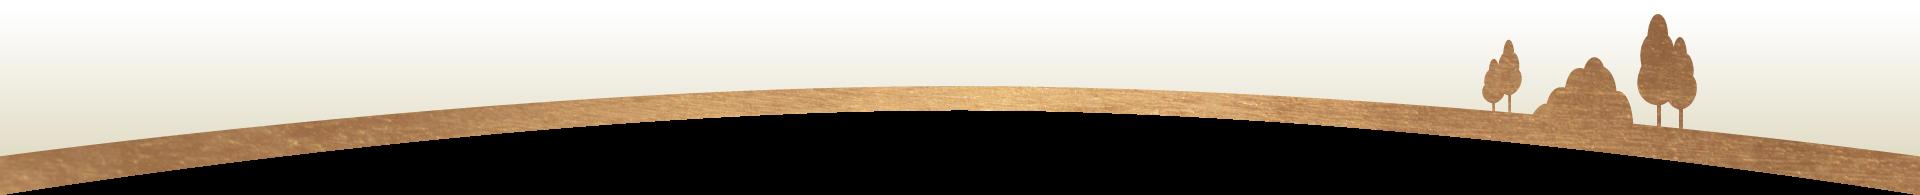 white-hill-gradient-bottom-195